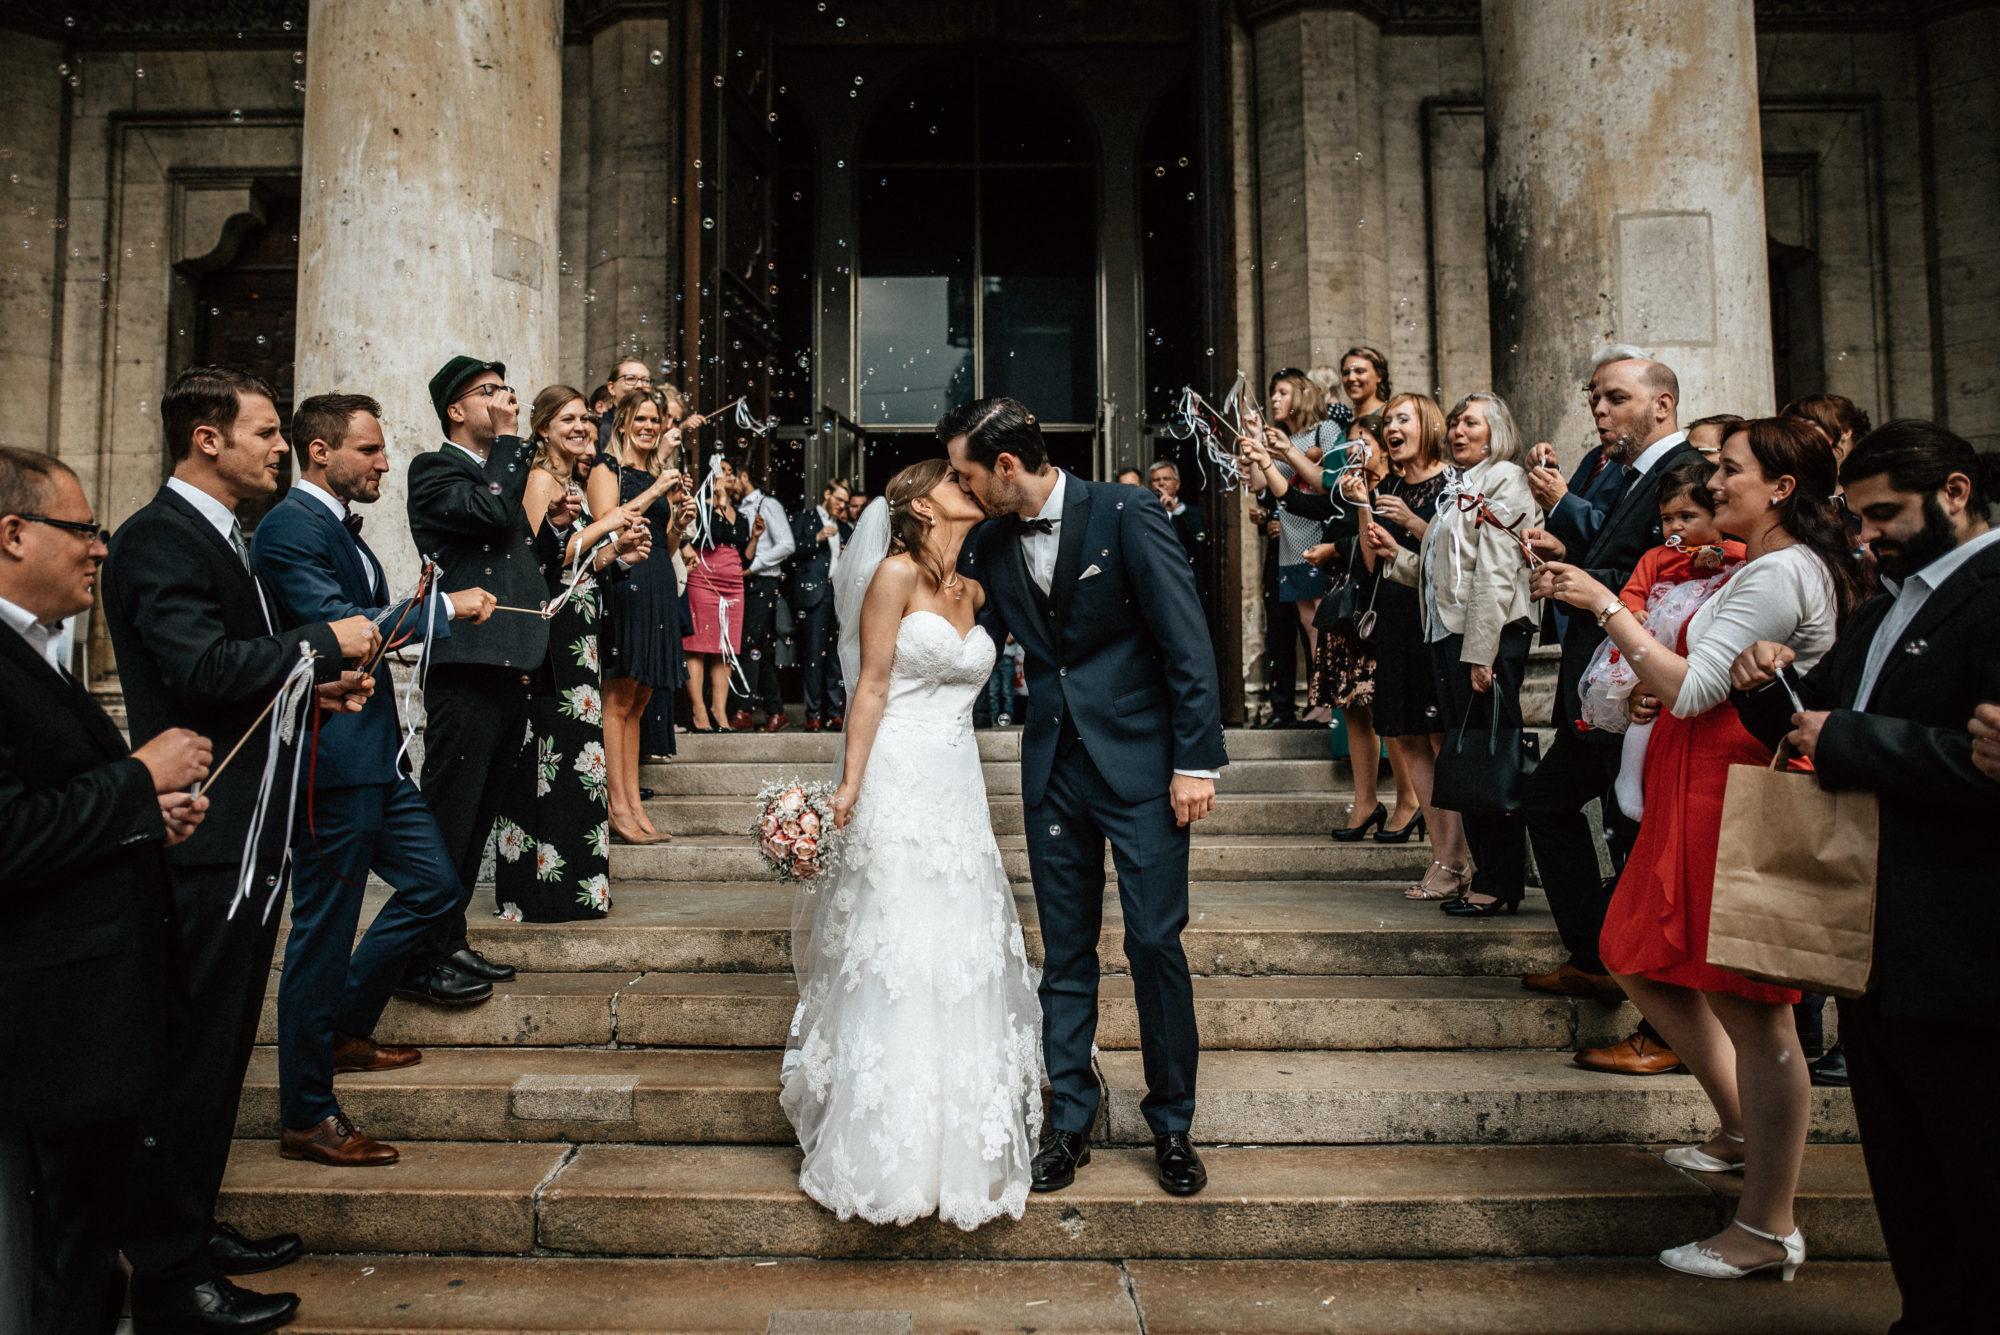 Timo Hess Fotografie : Hochzeitsfotograf Würzburg : Hochzeitsfotograf München : Hochzeitsreportage Susanne Und Simon Ludwigskirche